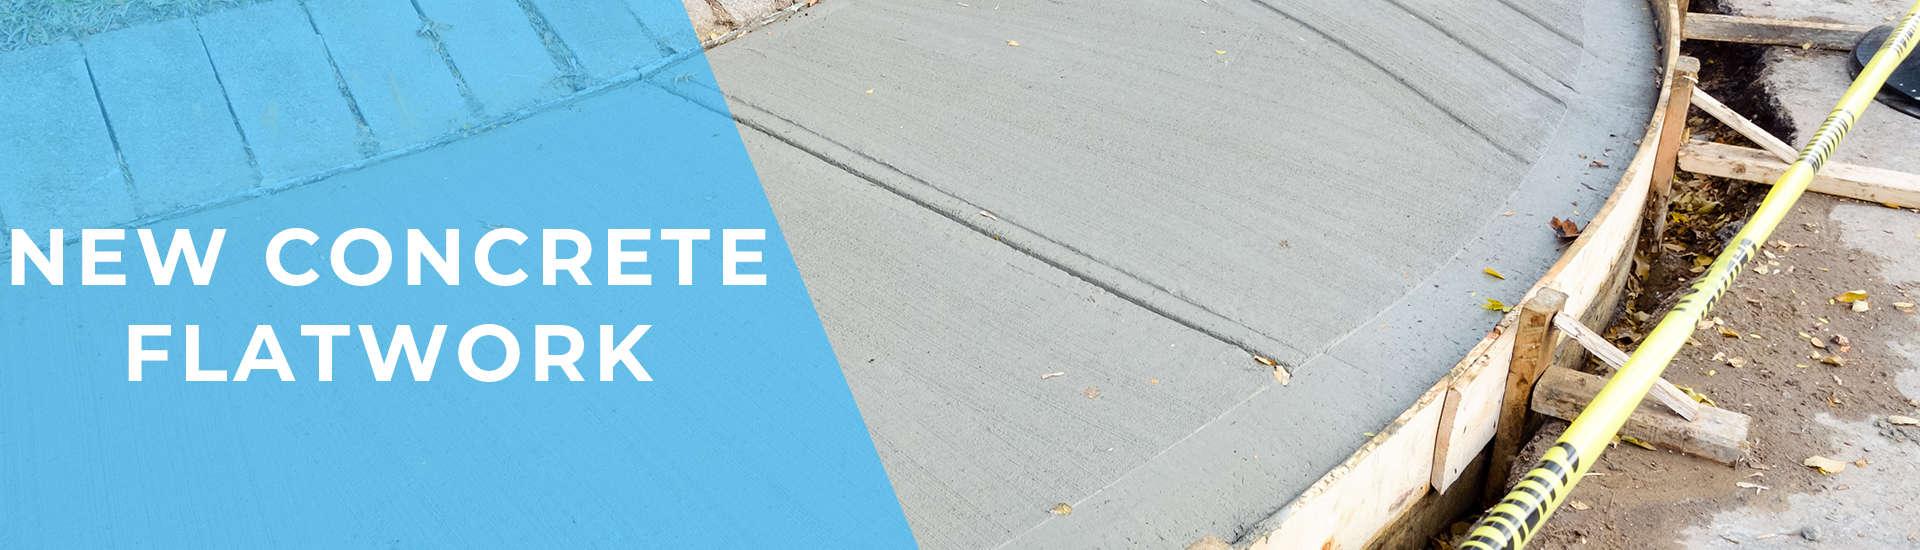 New Concrete Flatwork